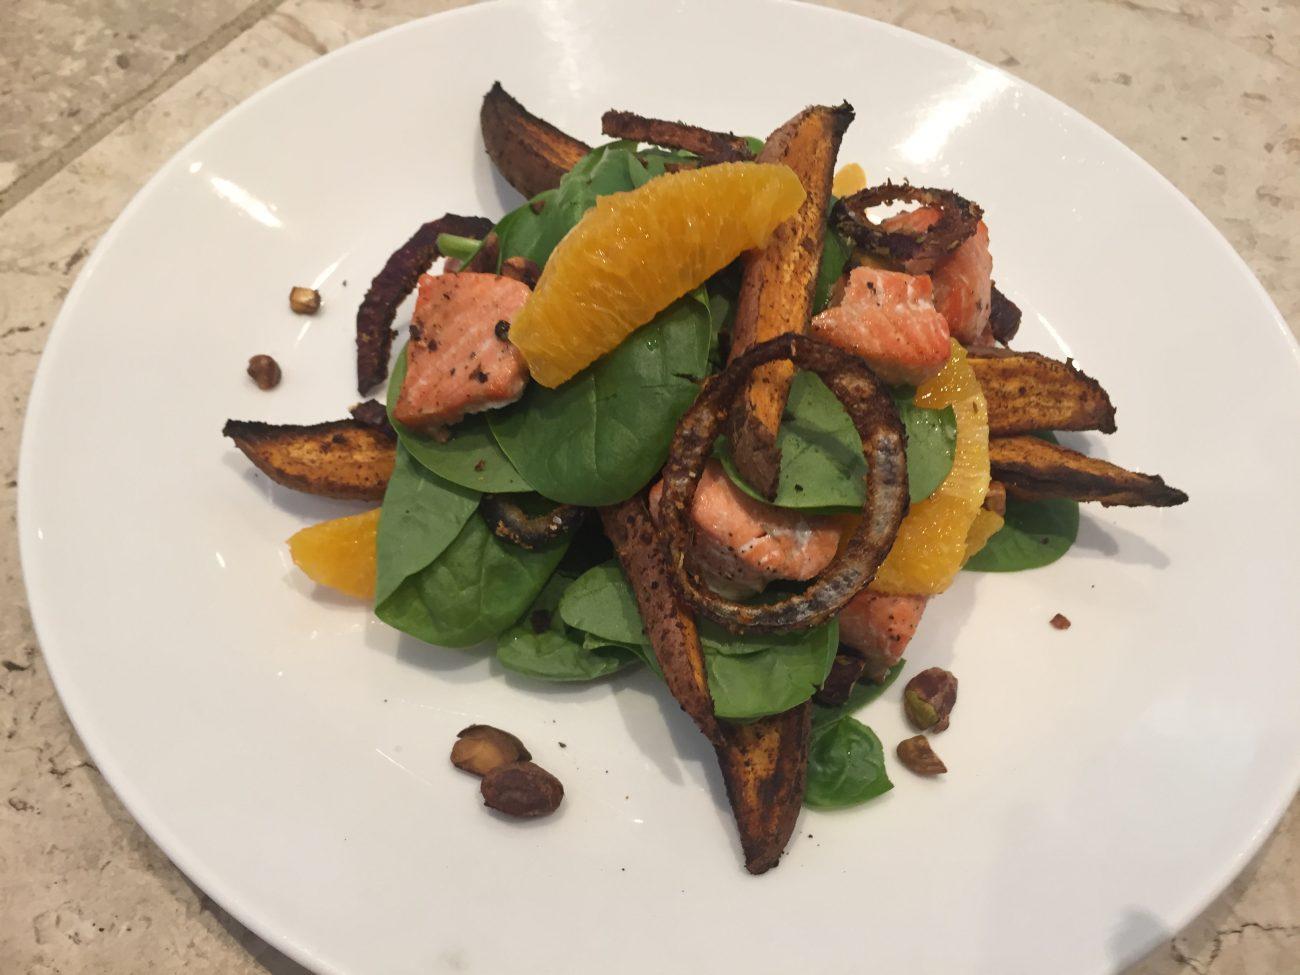 Pistachio, Orange and Salmon Salad